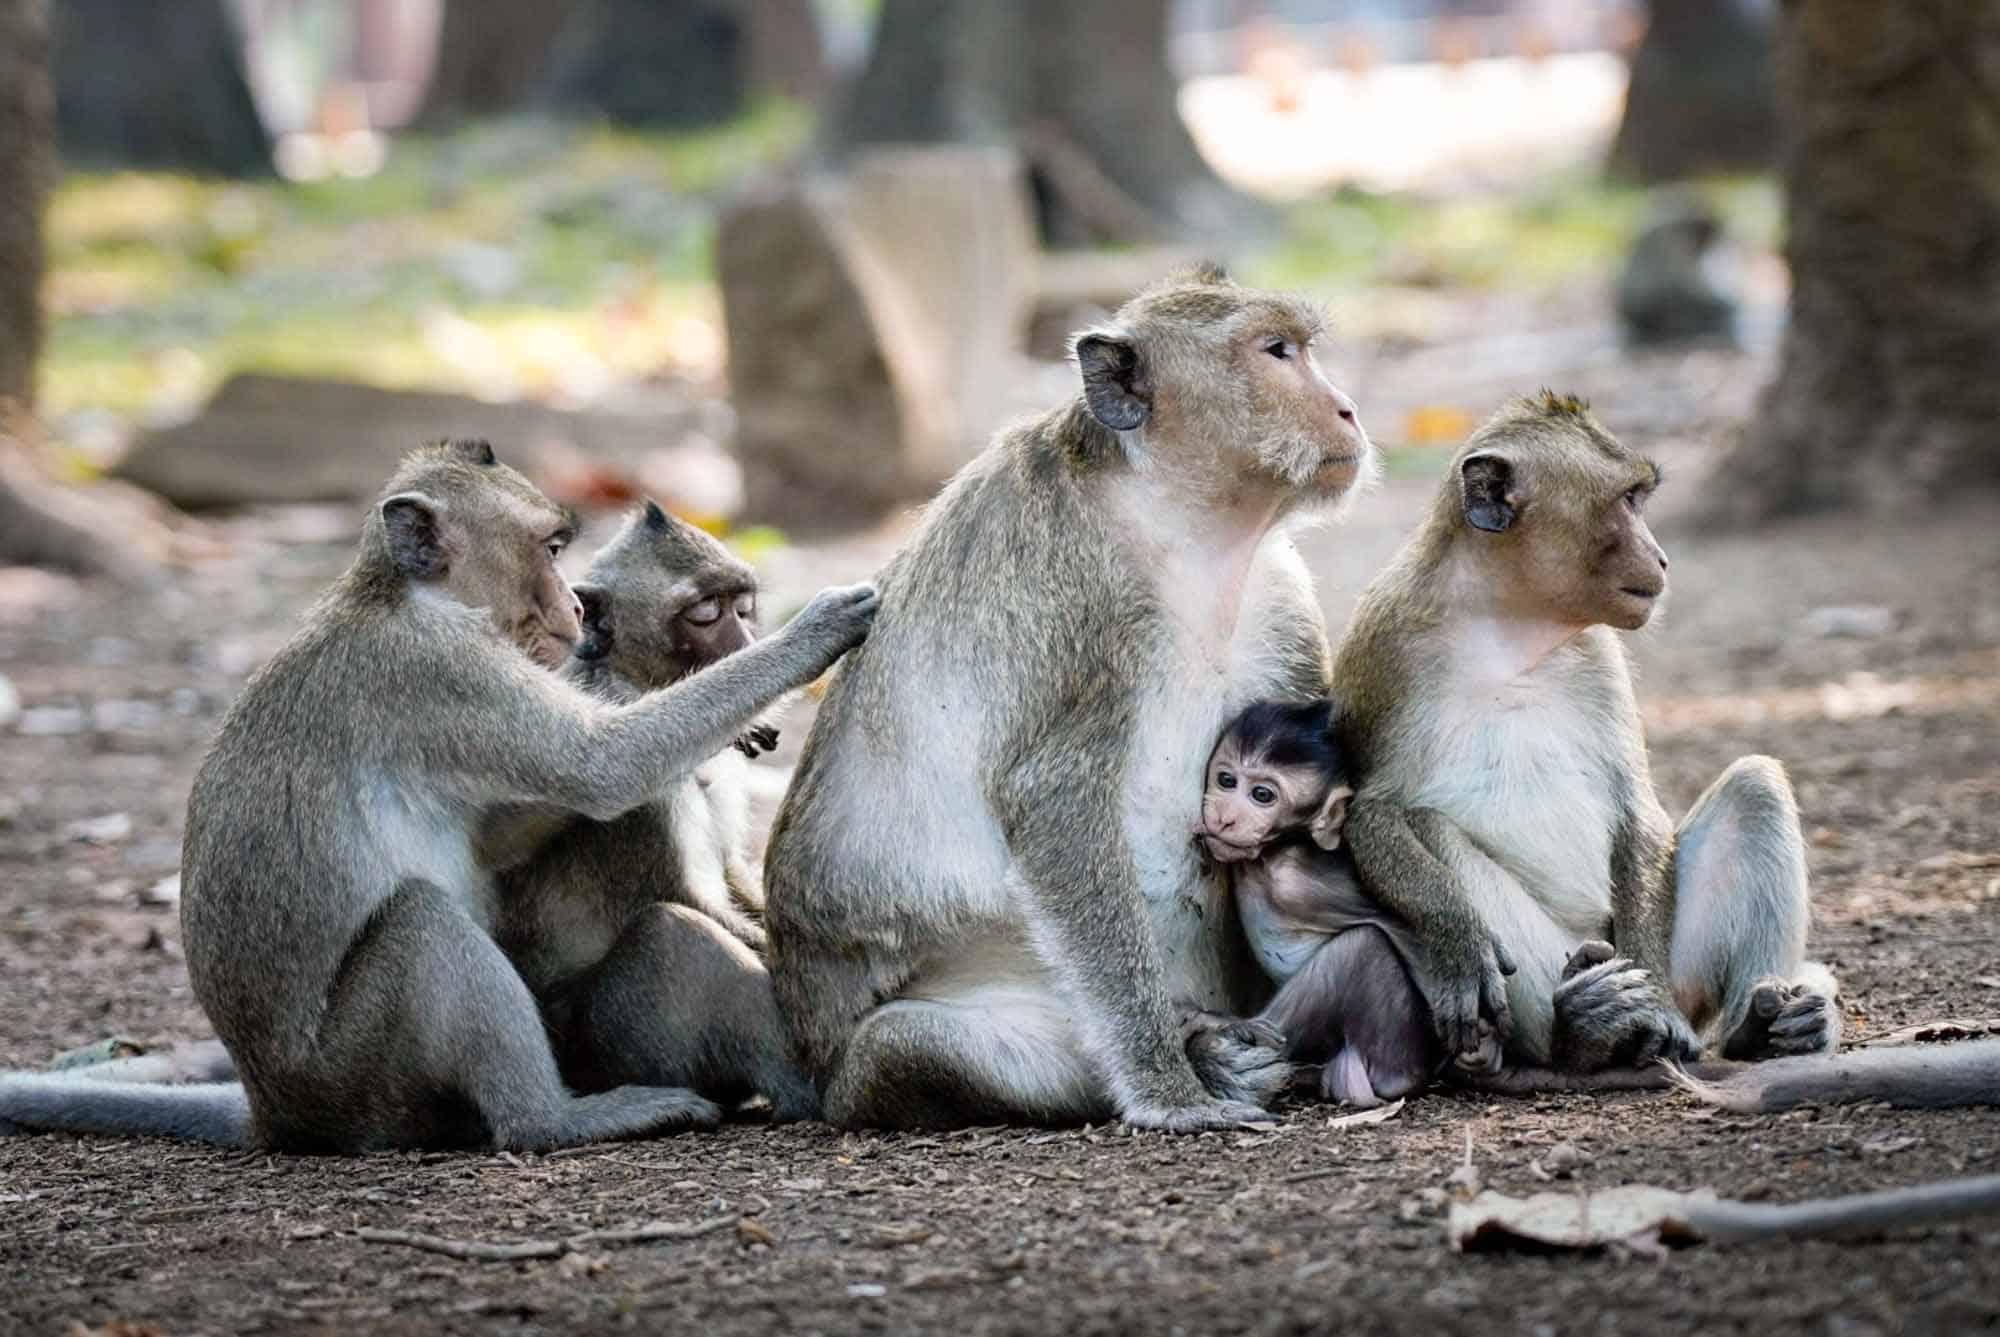 Group of Monkeys at Bayon Temple